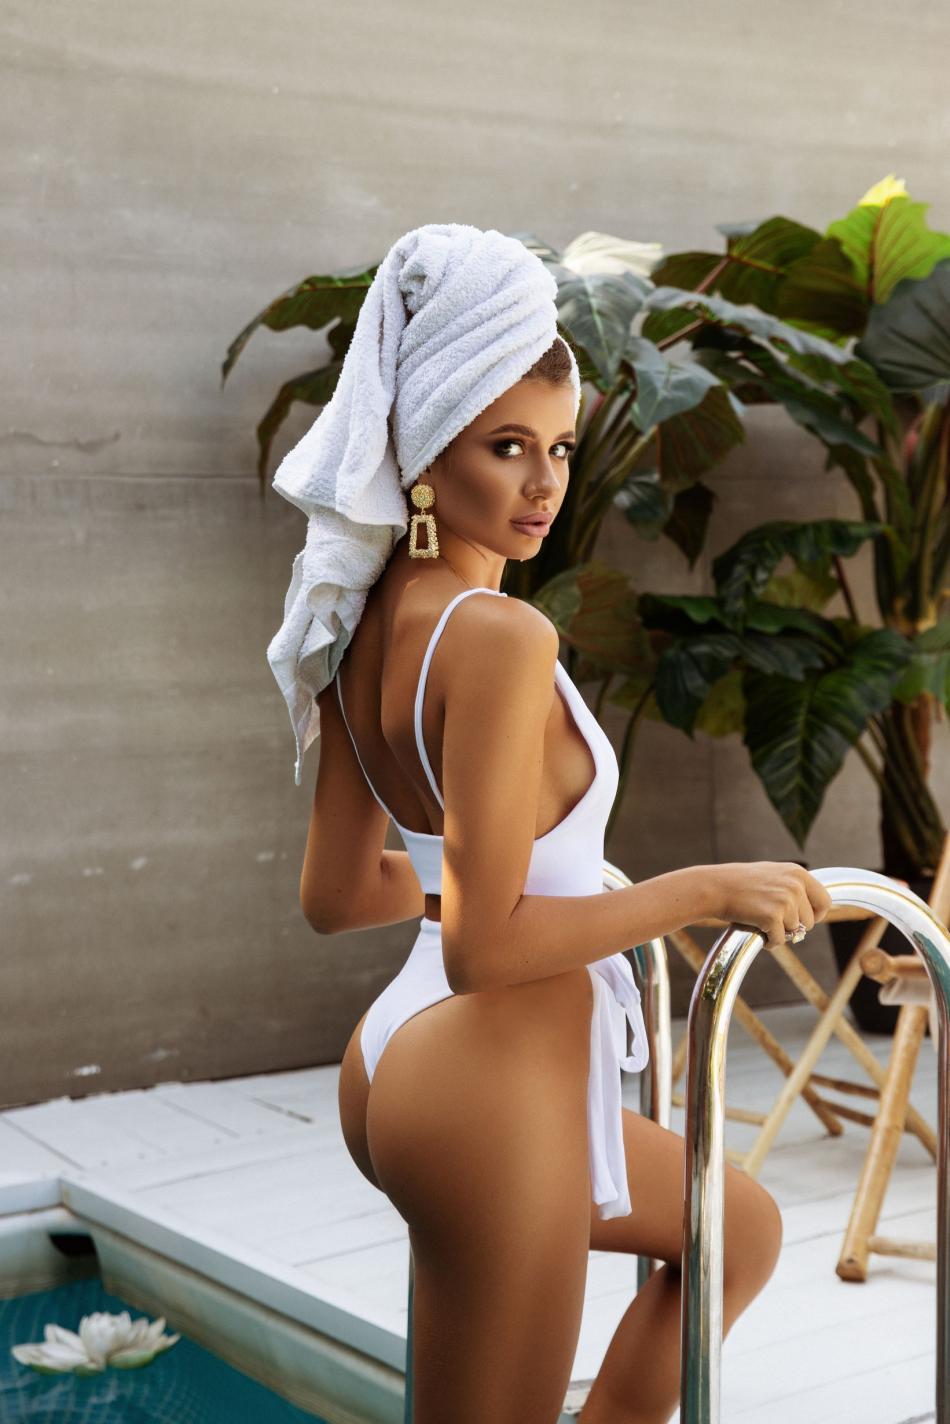 alt Ladyfordaddy.com Tina Escort Girl In New York 7704112 - 2 2